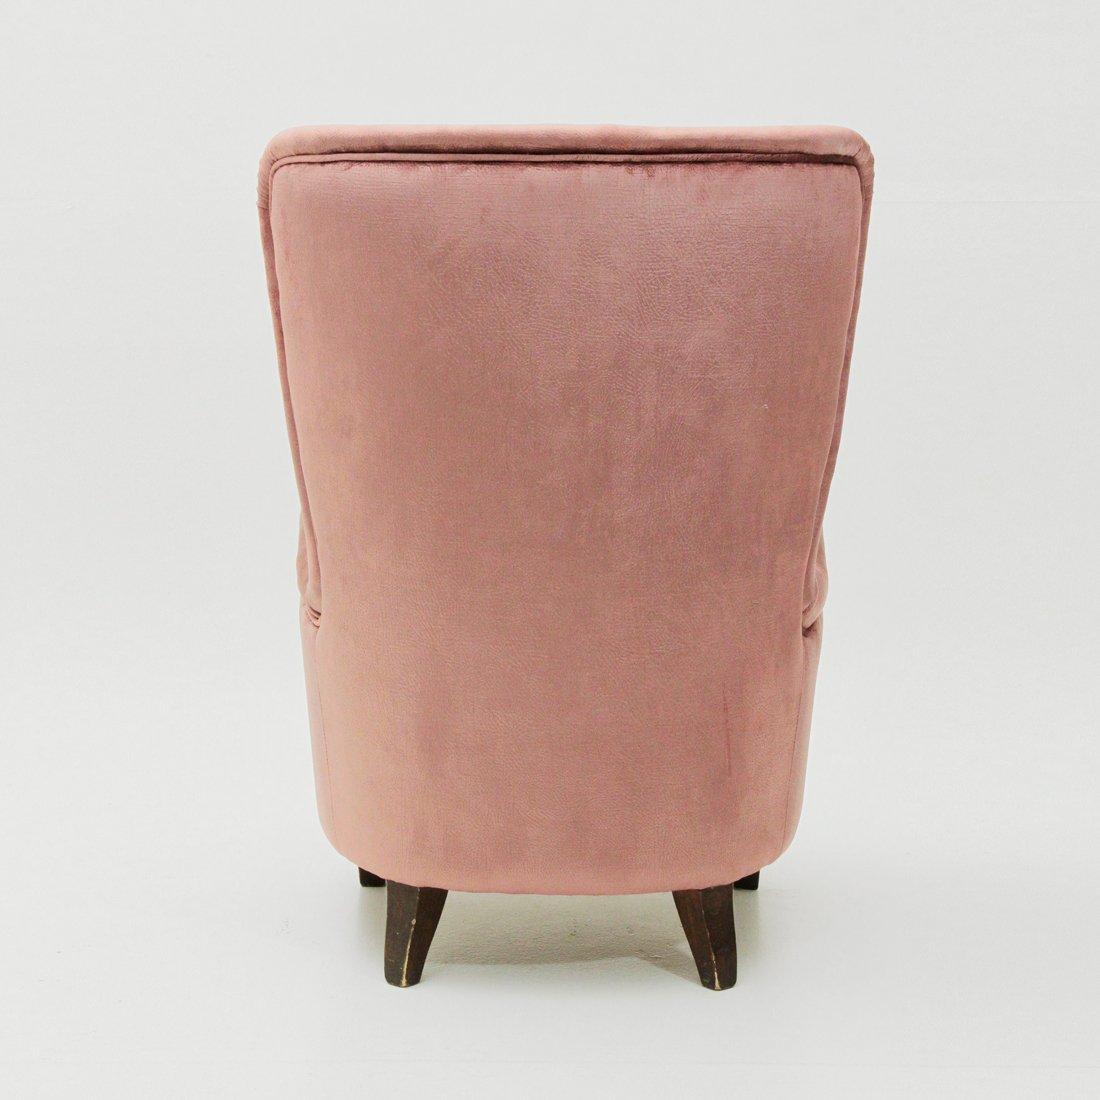 italienischer rosa samt sessel 1950er bei pamono kaufen. Black Bedroom Furniture Sets. Home Design Ideas